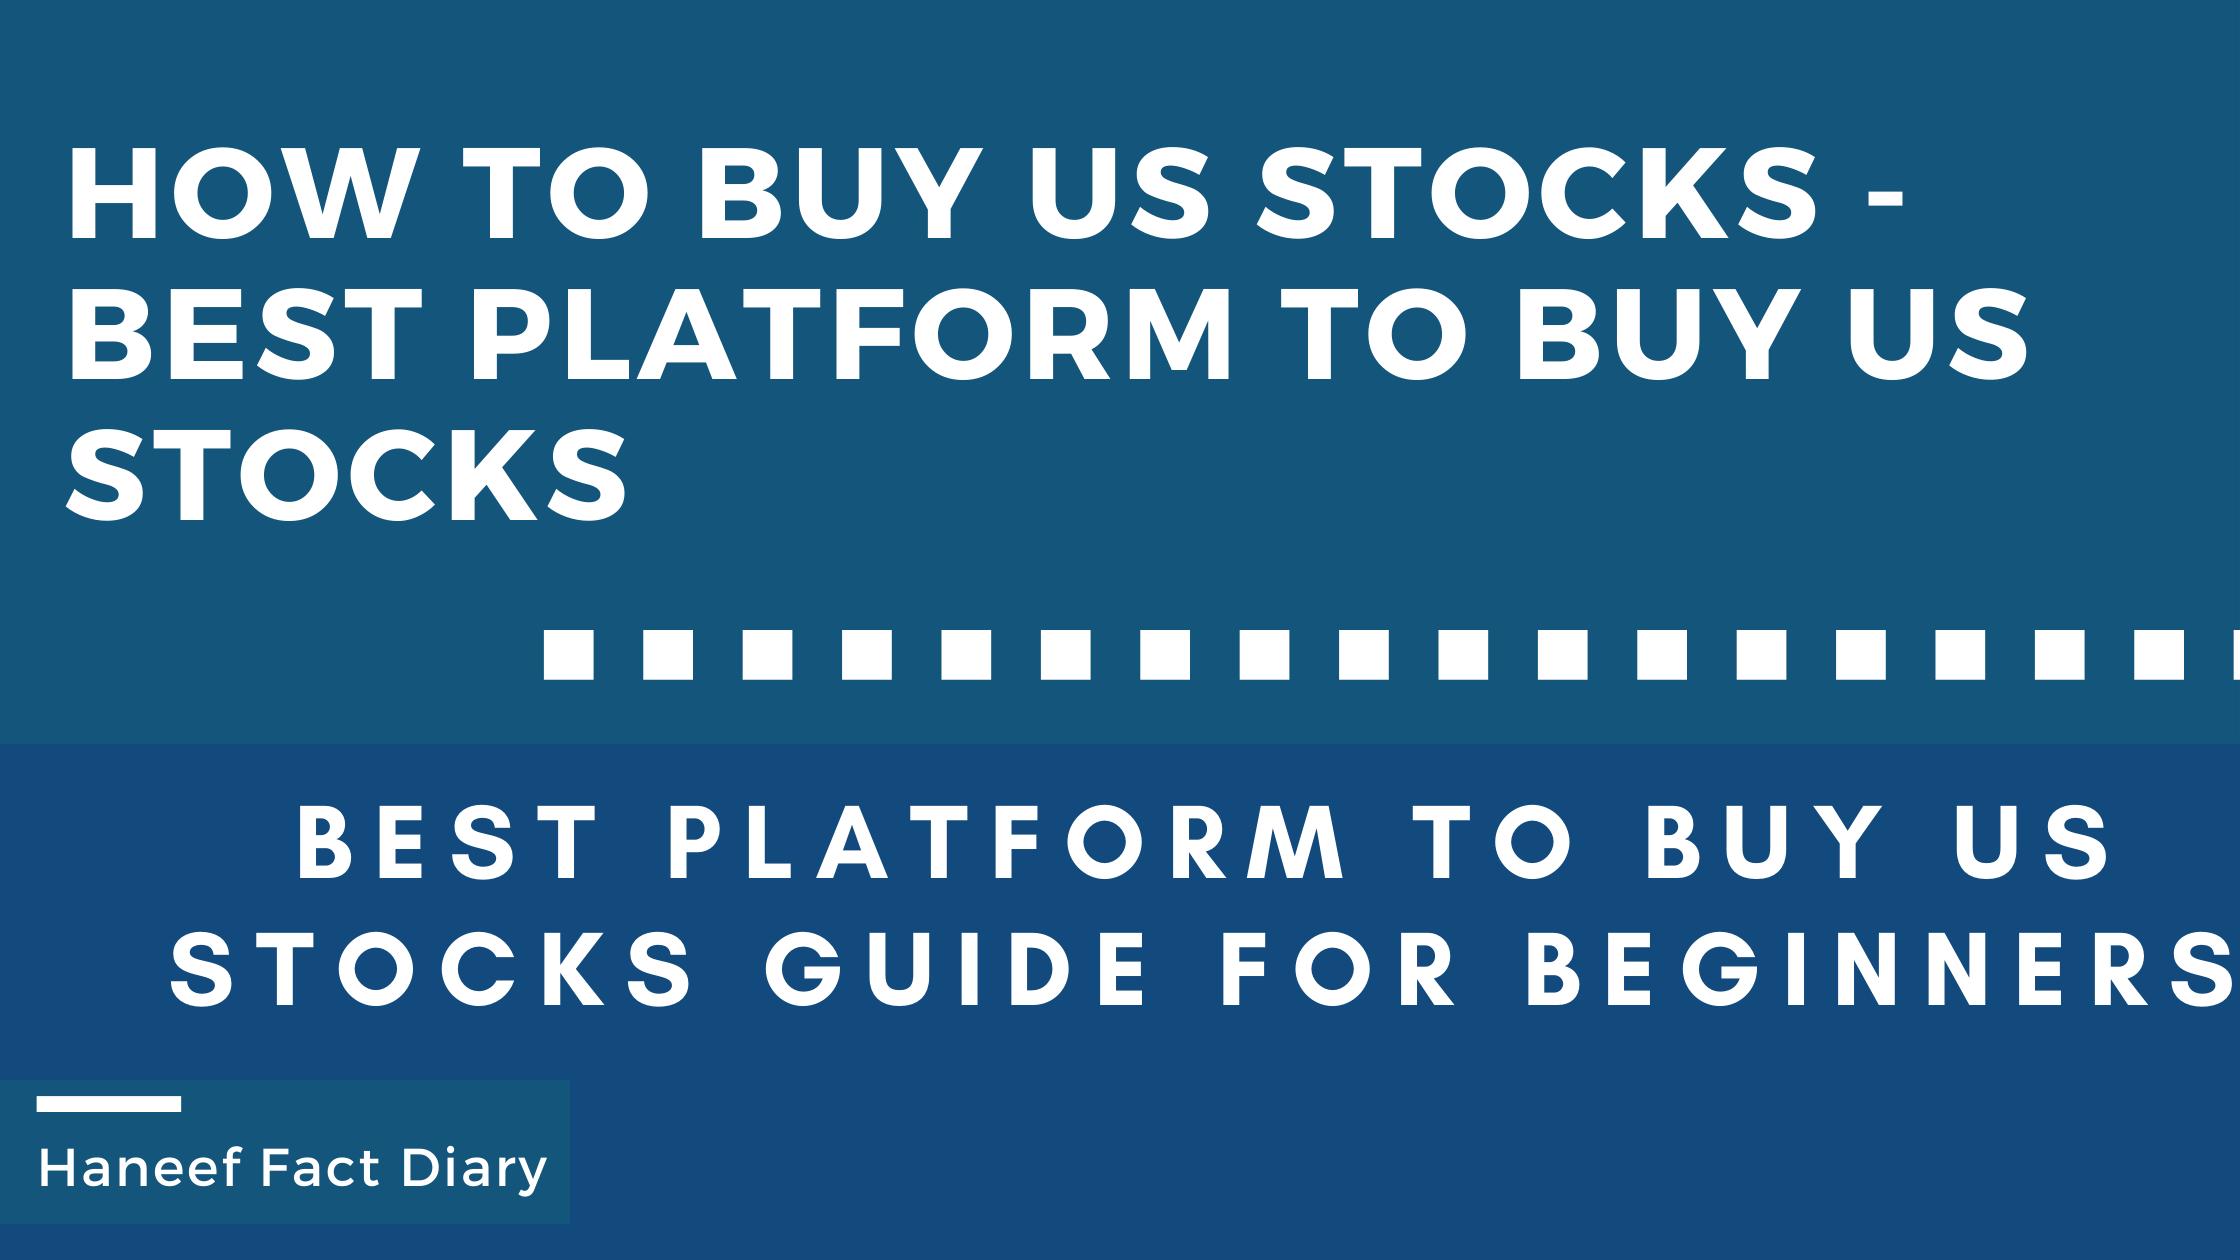 How to Buy us stocks - Best Platform to buy us stocks